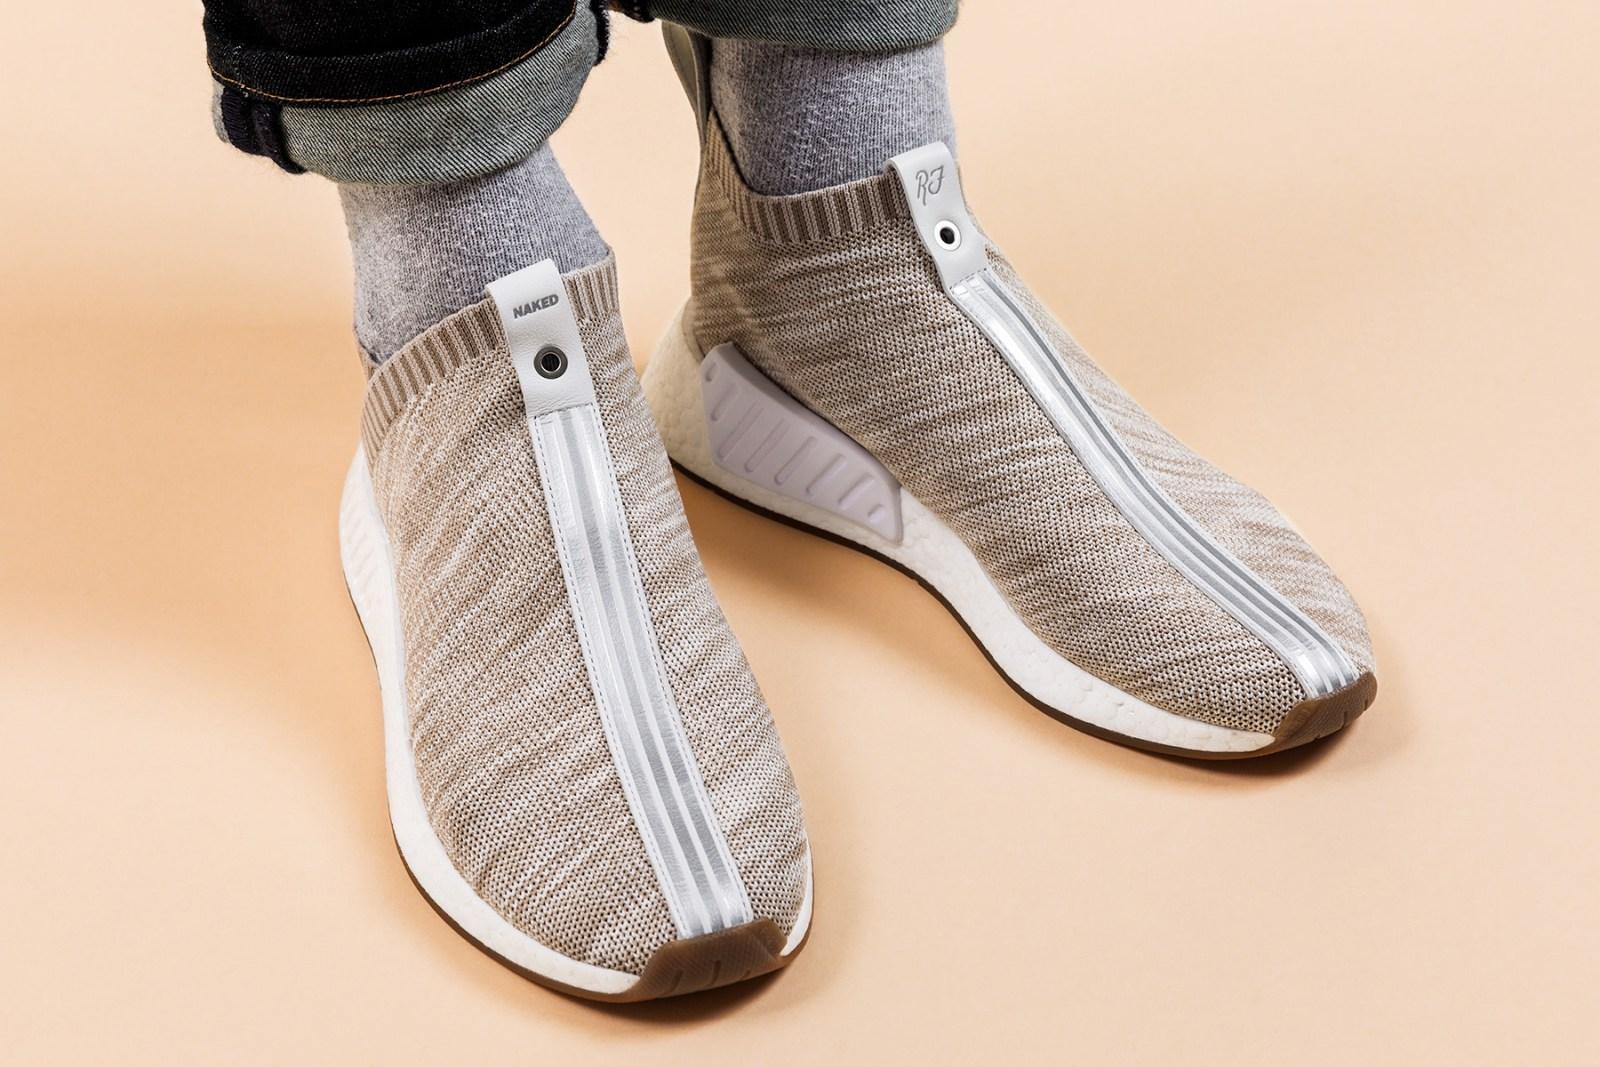 PREMIUM QUALITY Adidas Nmd Cs2 X Kith x Naked